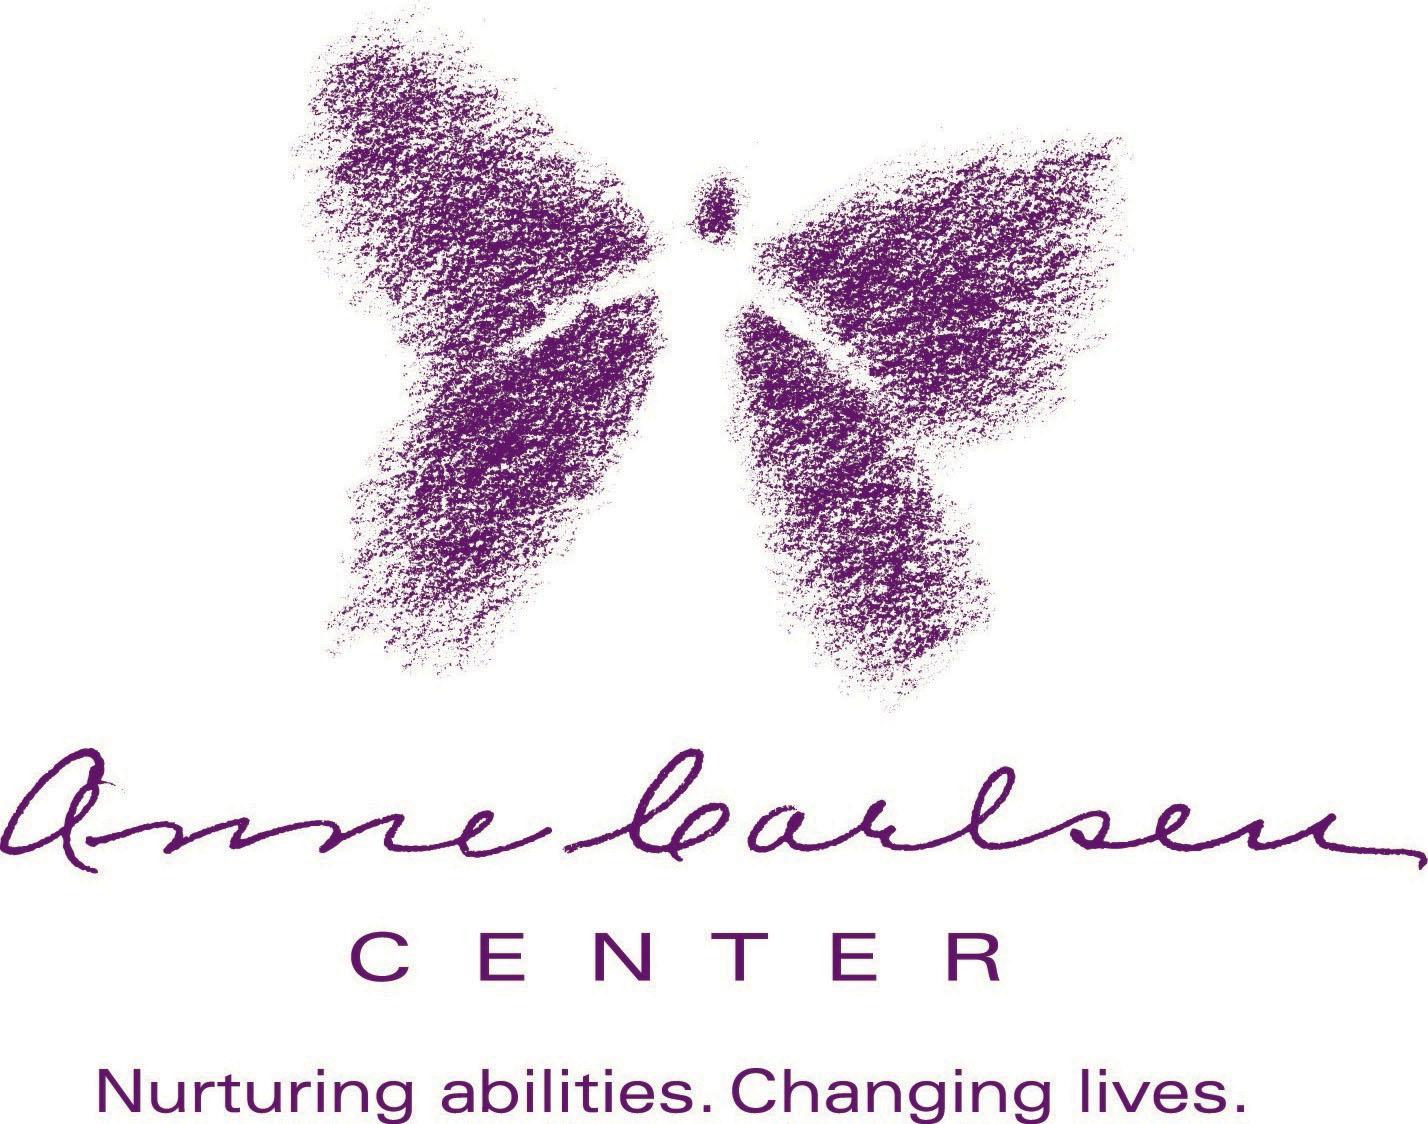 Anne Carlsen Center more info at https://annecarlsen.org/